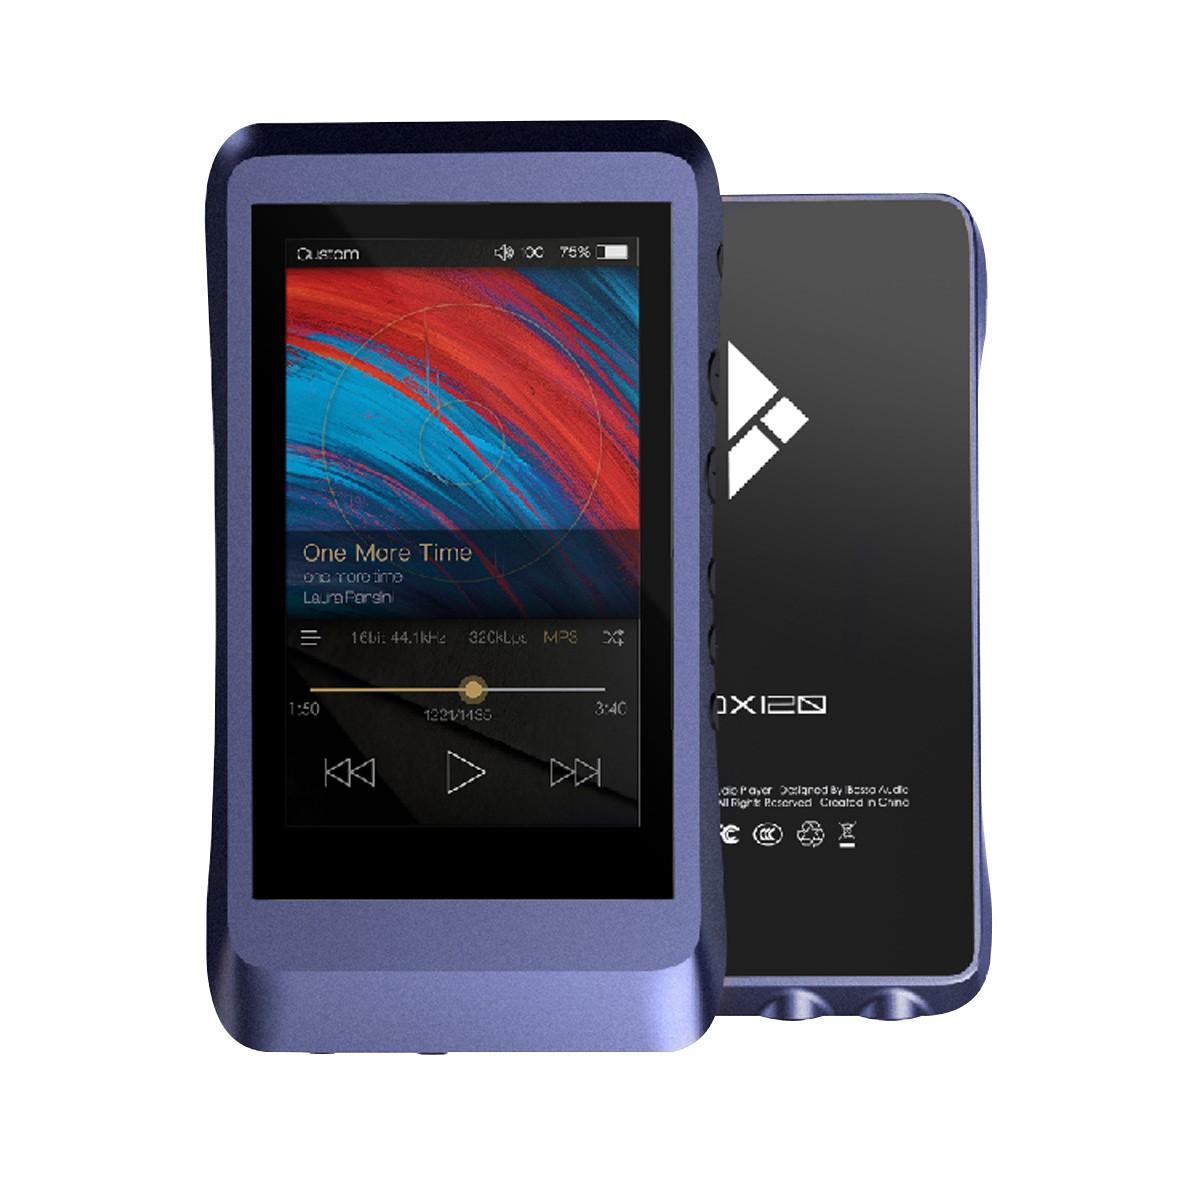 IBASSO DX120 Baladeur Numérique DAP HiFi DAC AK4495 32bit 384kHz DSD128 Bleu